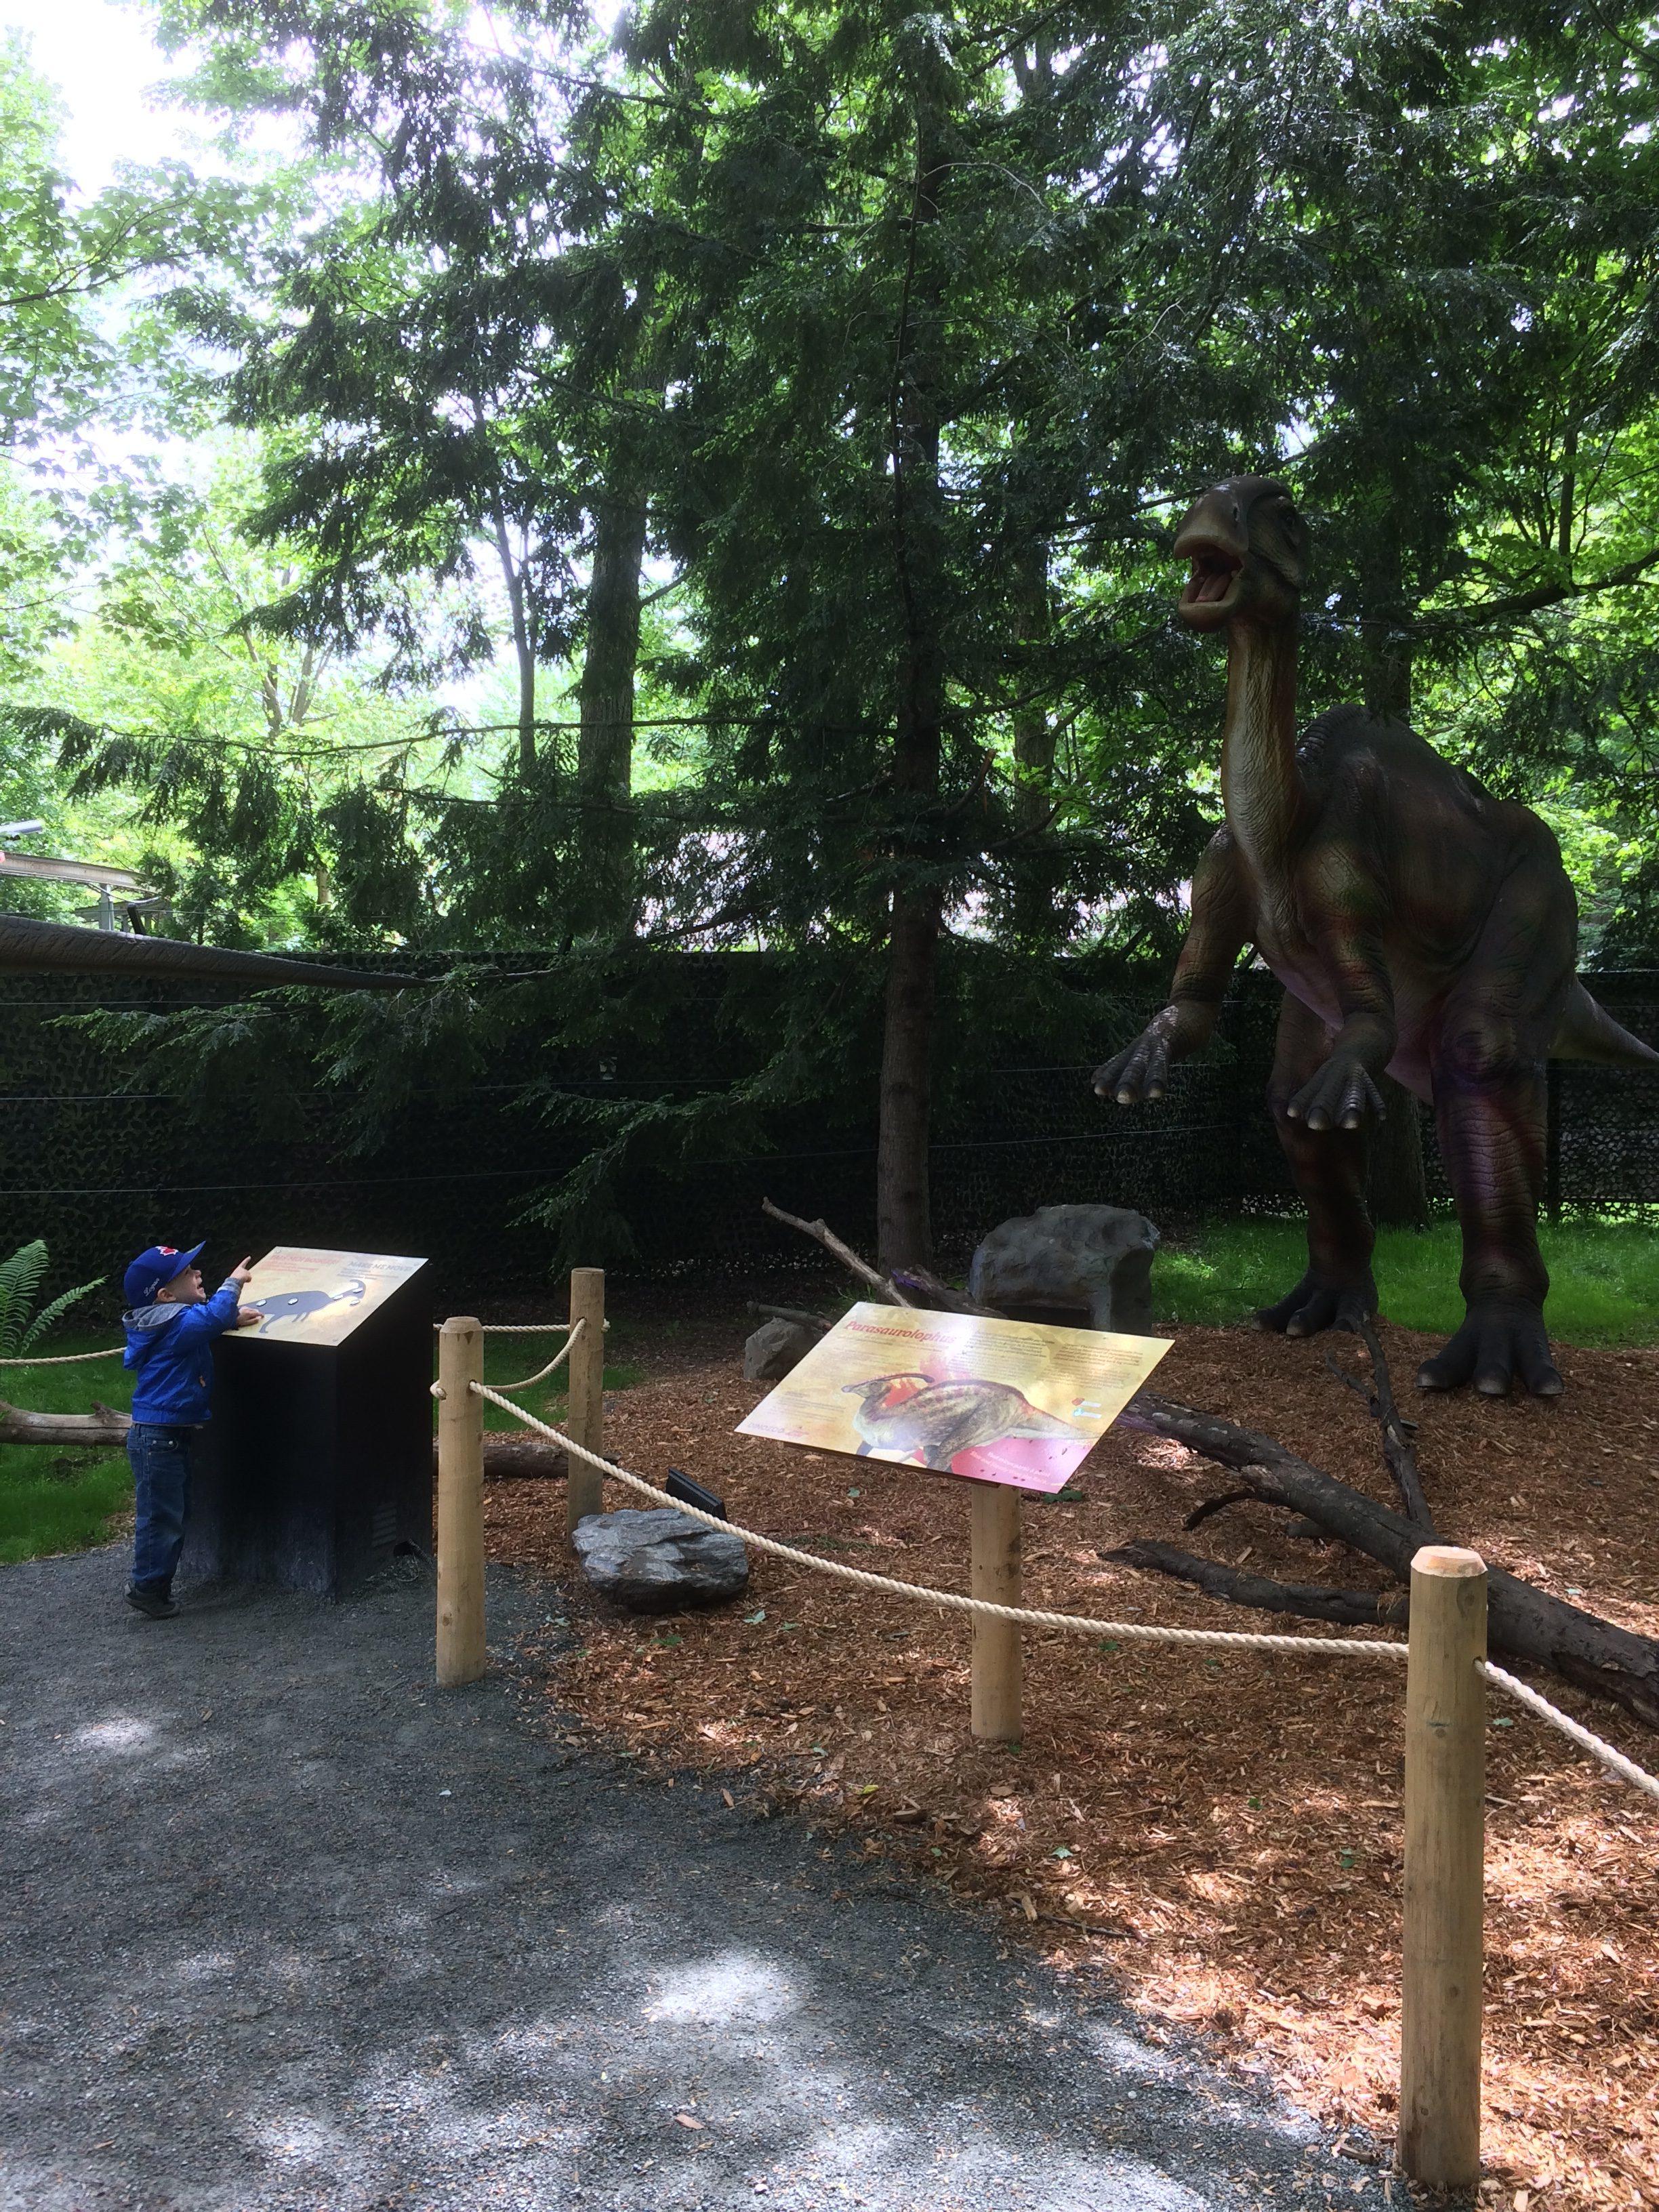 dinozoo, zoo de granby, dinosaure, famille, activité